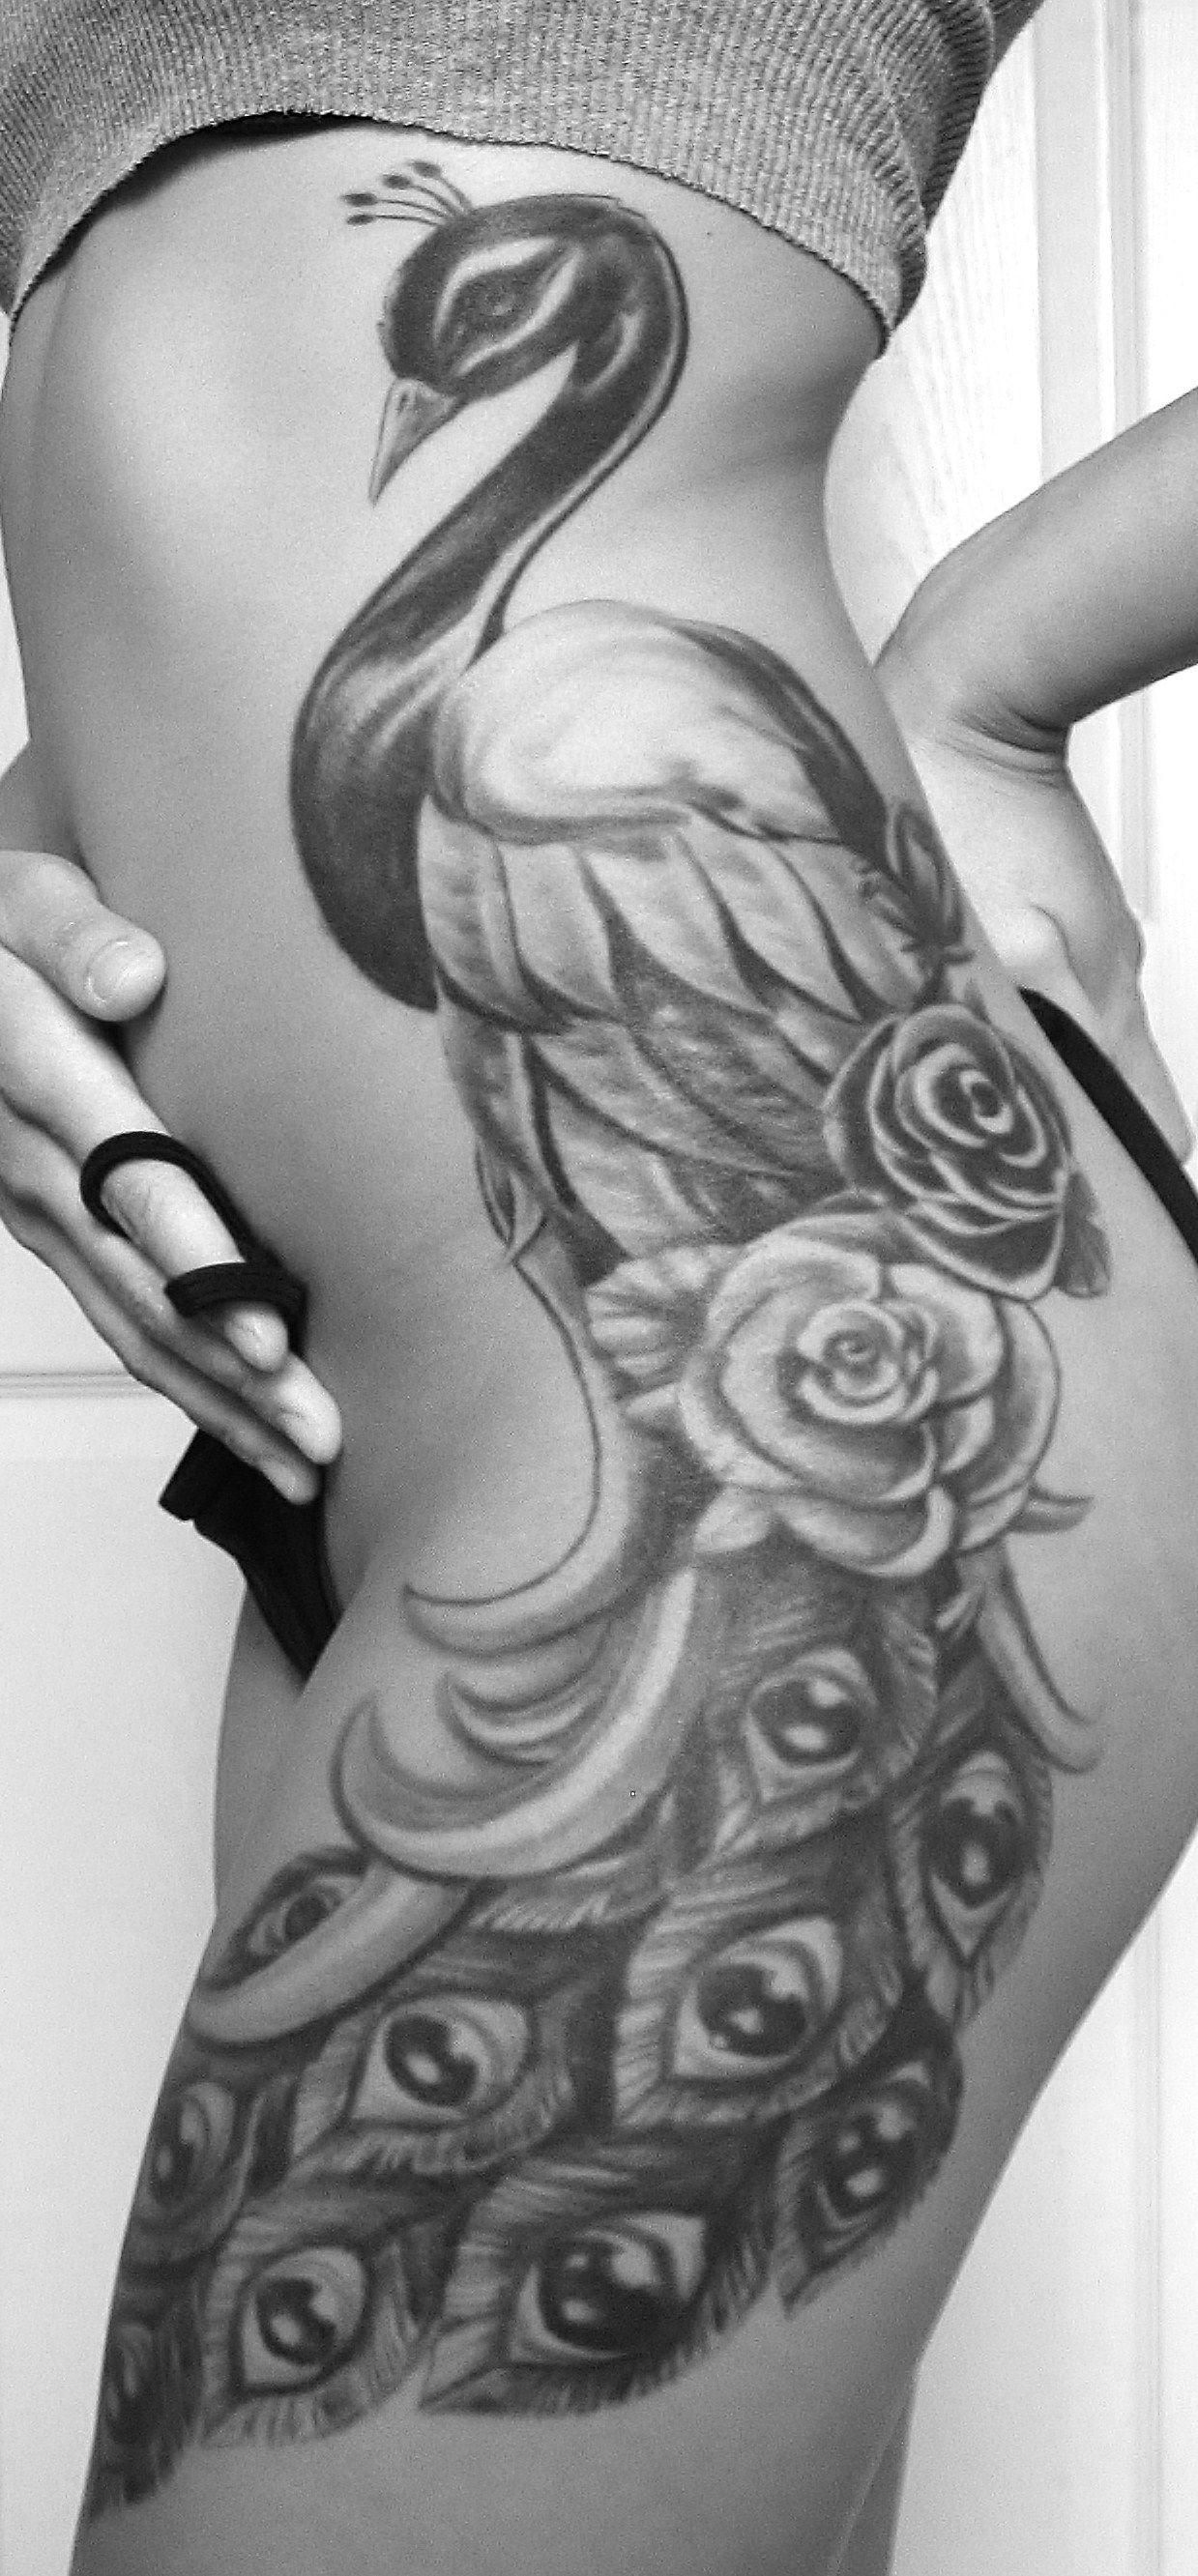 Luxury ornate black-and-white peacock tattoo design ...  |Peacock Tattoo Black And White